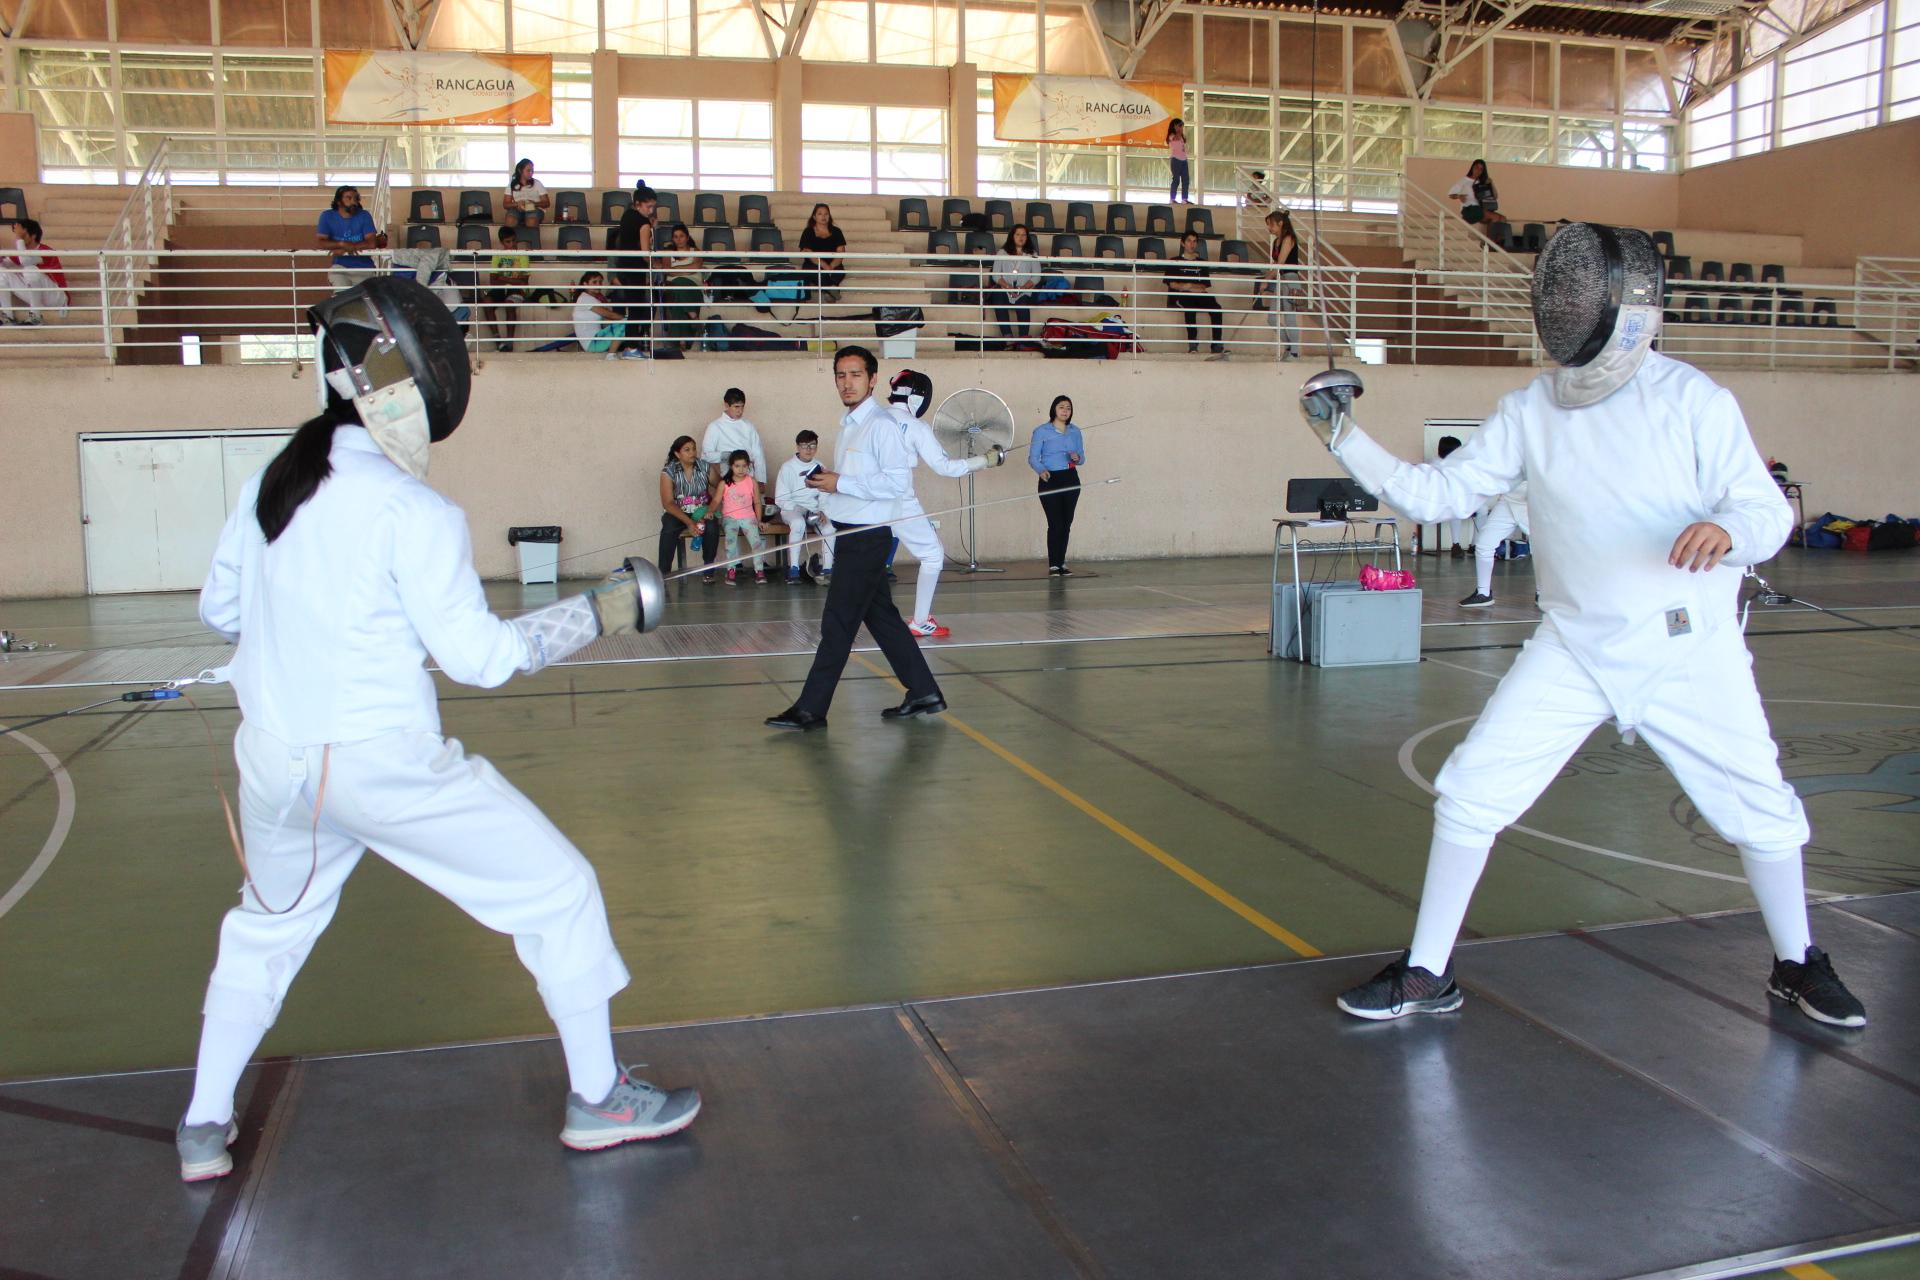 Primer Torneo Regional de Esgrima se llevó a cabo en Rancagua